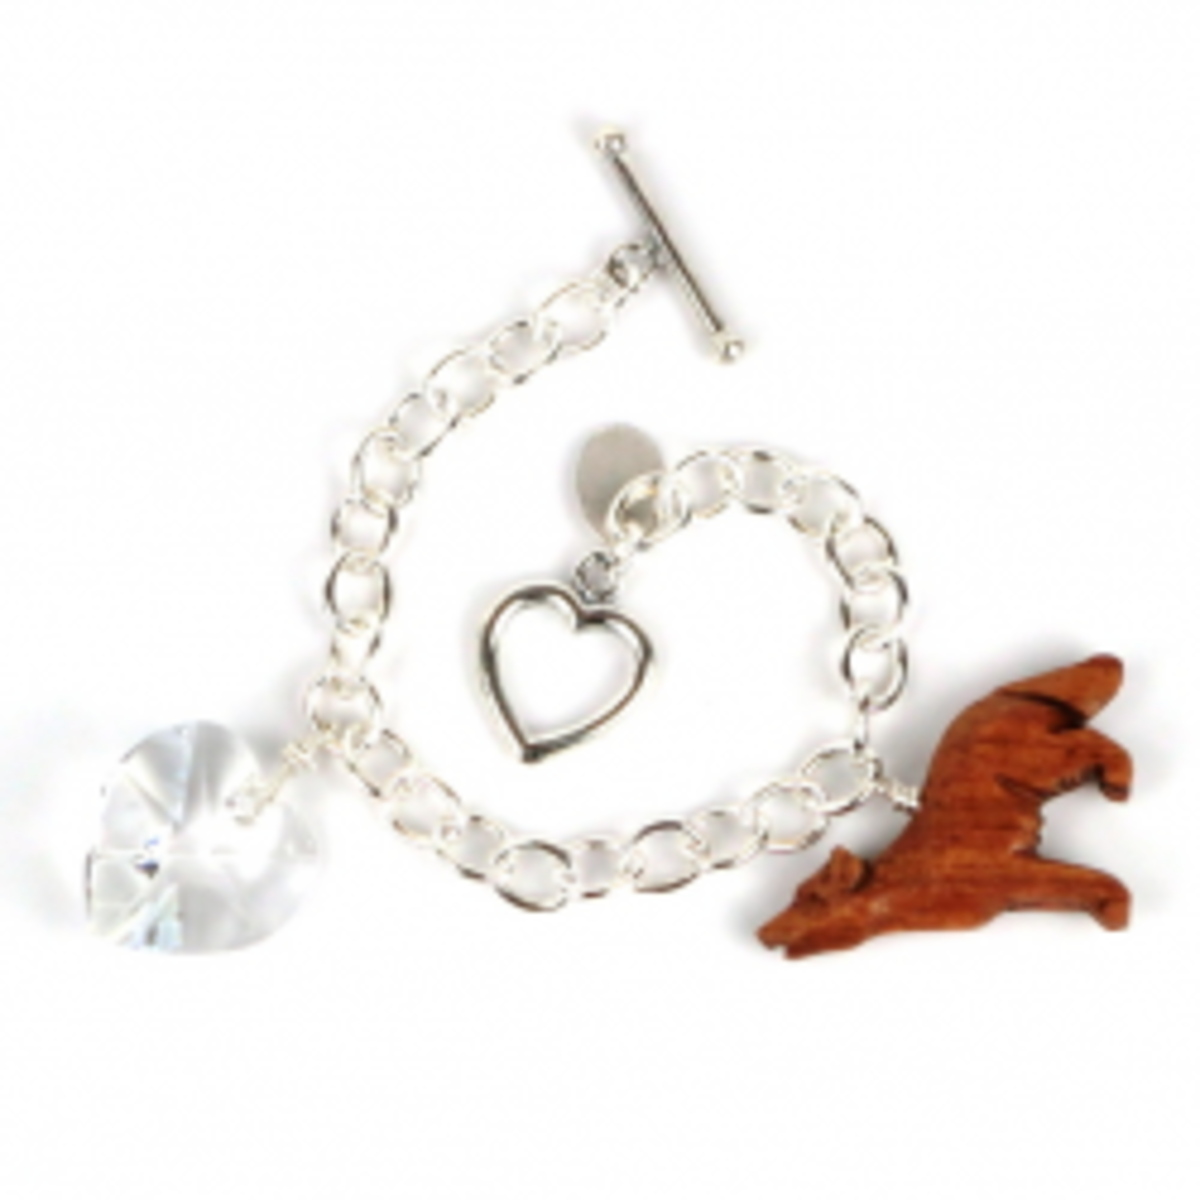 Bella Bracelet with Wooden Wolf Charm and Swarovski Heart Charm